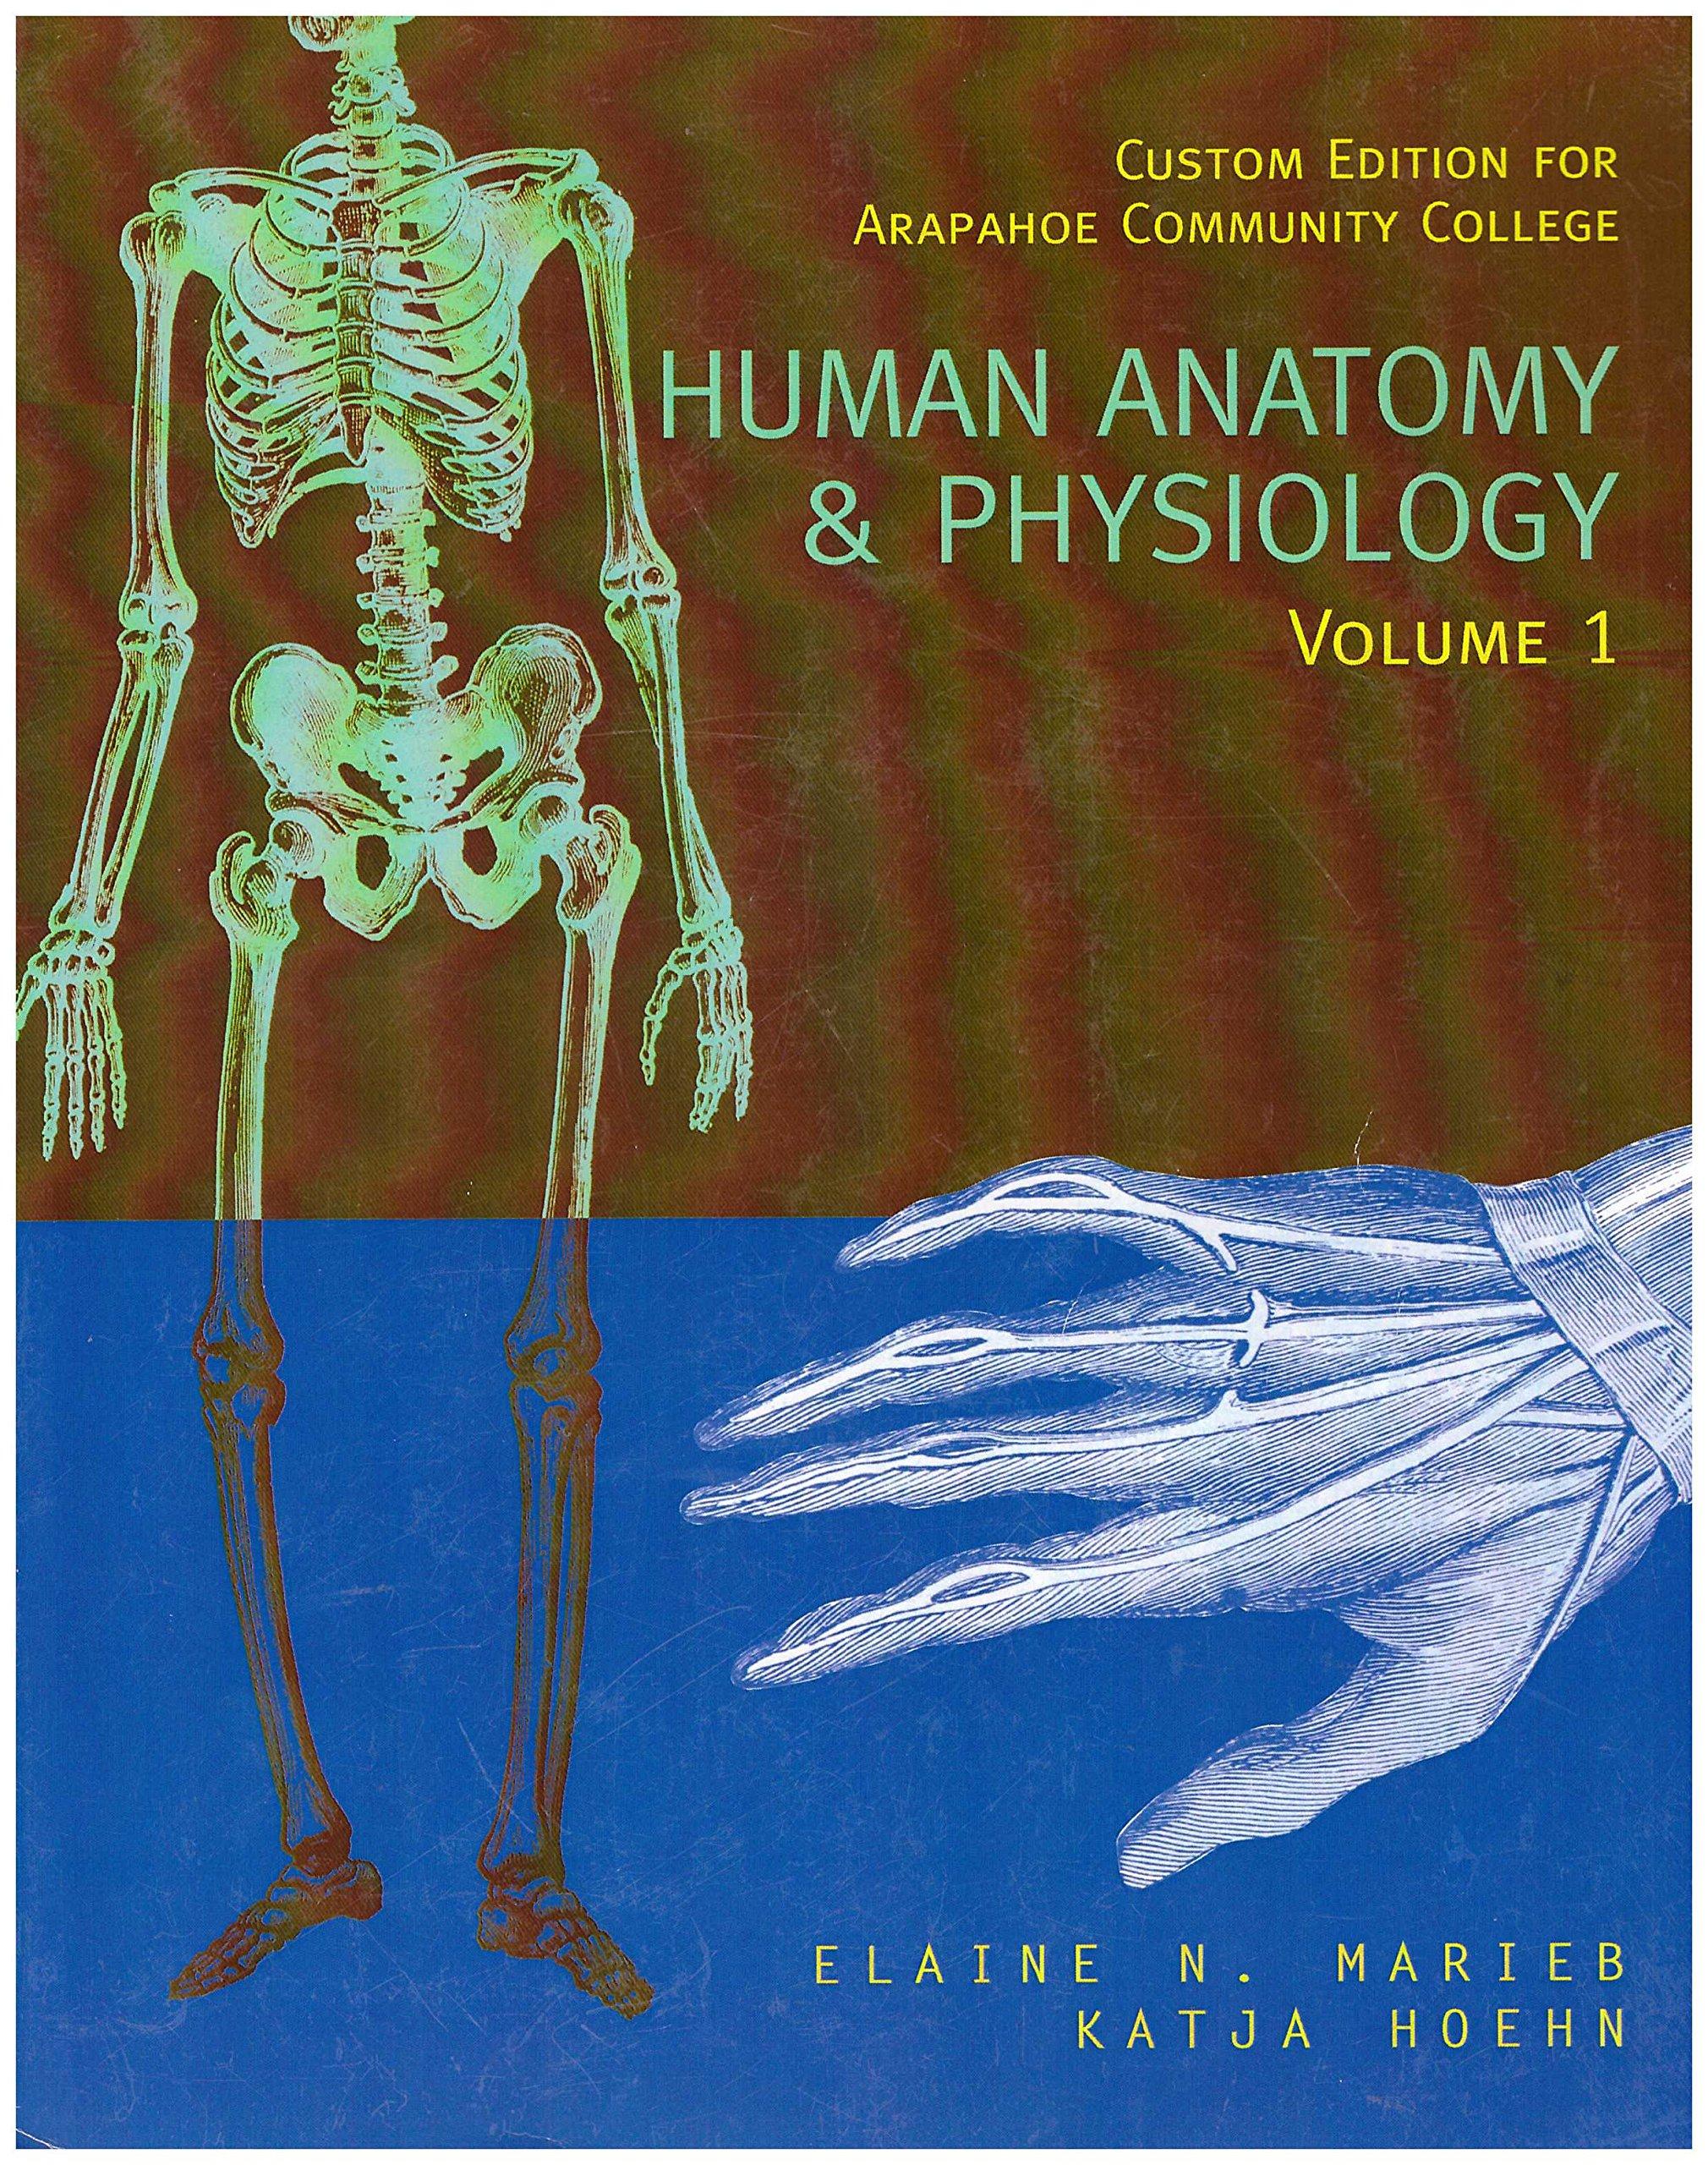 Human Anatomy & Physiology, Volume 1: Custom Edition for Arapahoe ...